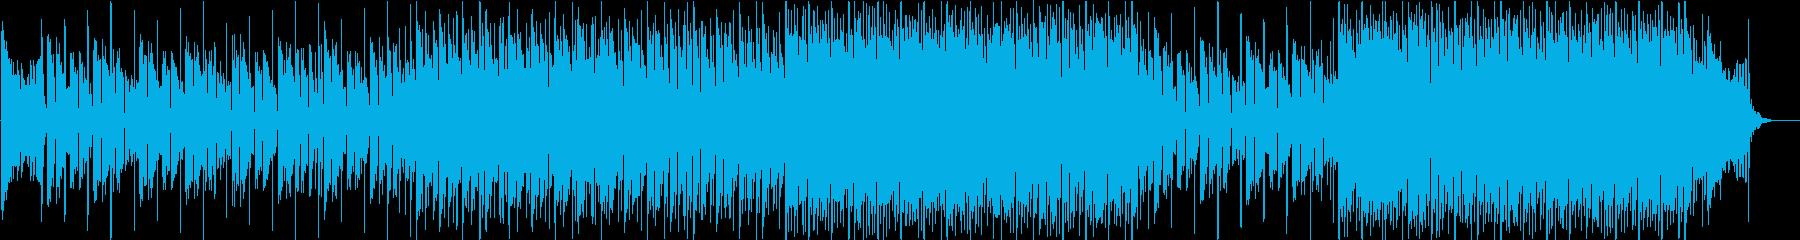 Inspirational Chilloutの再生済みの波形